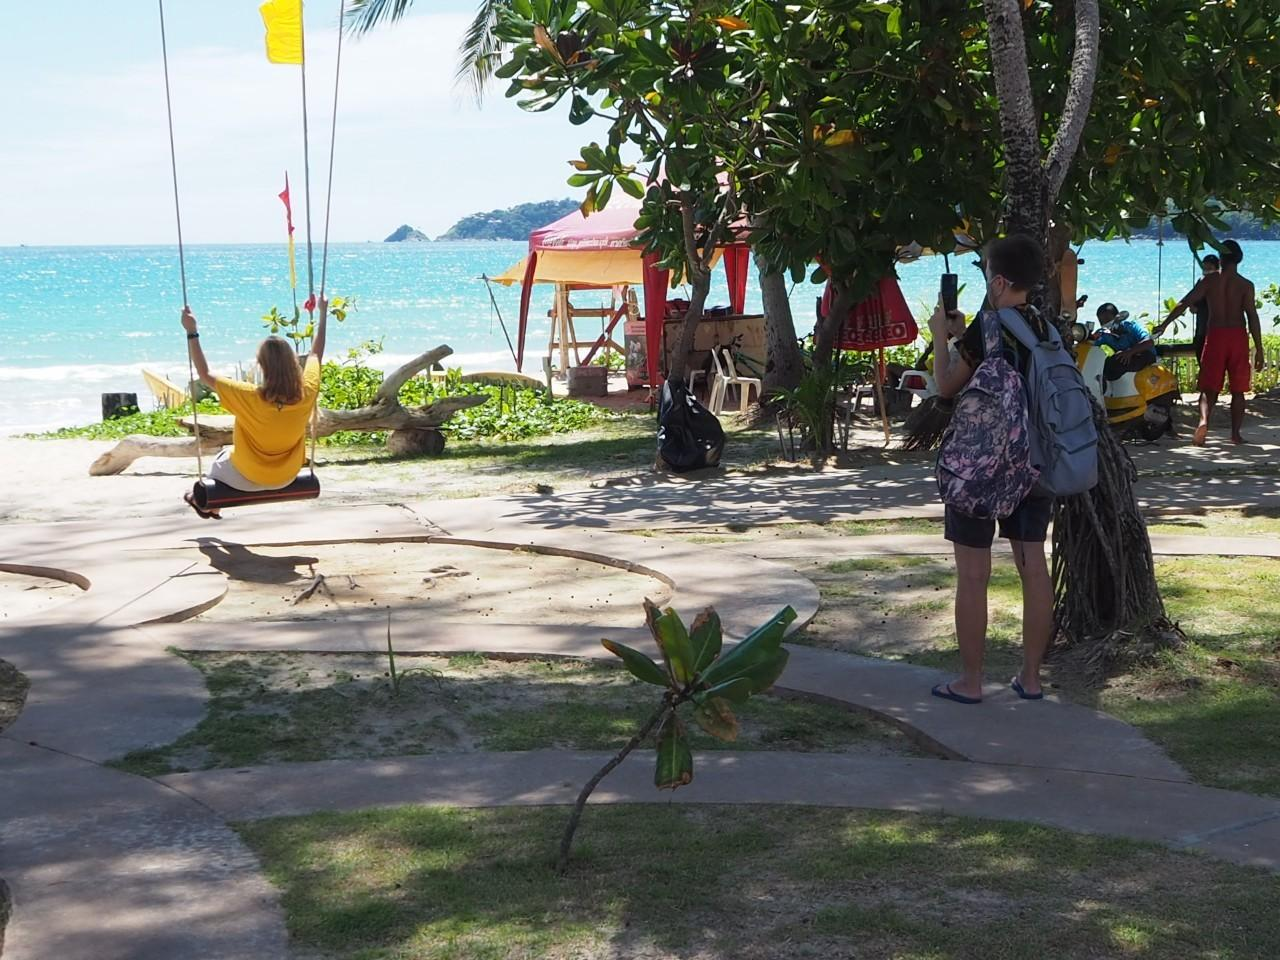 A tourist takes photos at Patong beach in Phuket, which has seen a gradual increase in tourists thanks to the Phuket sandbox programme.Dusida Worrachaddejchai